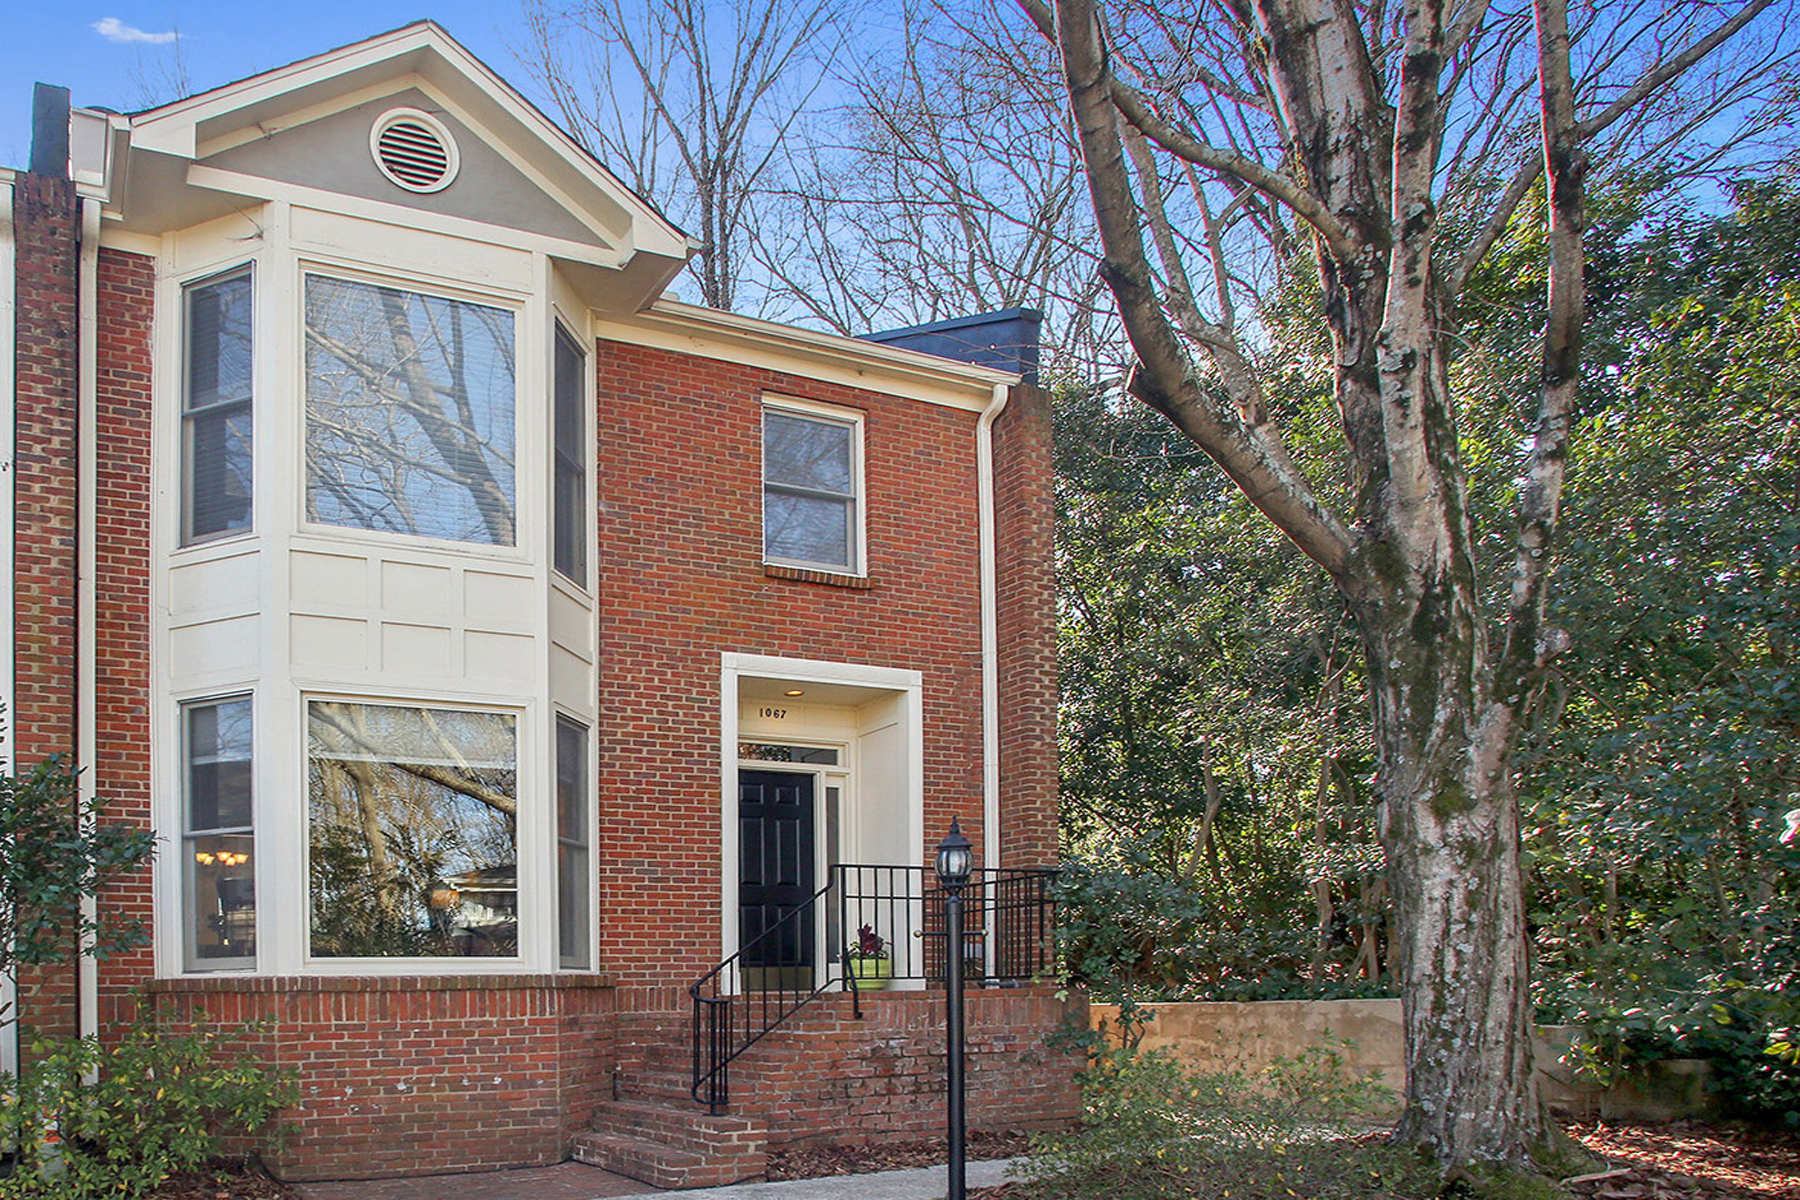 多棟聯建住宅 為 出售 在 Unique Renovated Townhome In Prime Location 1067 High Point Drive NE Atlanta, 喬治亞州, 30306 美國